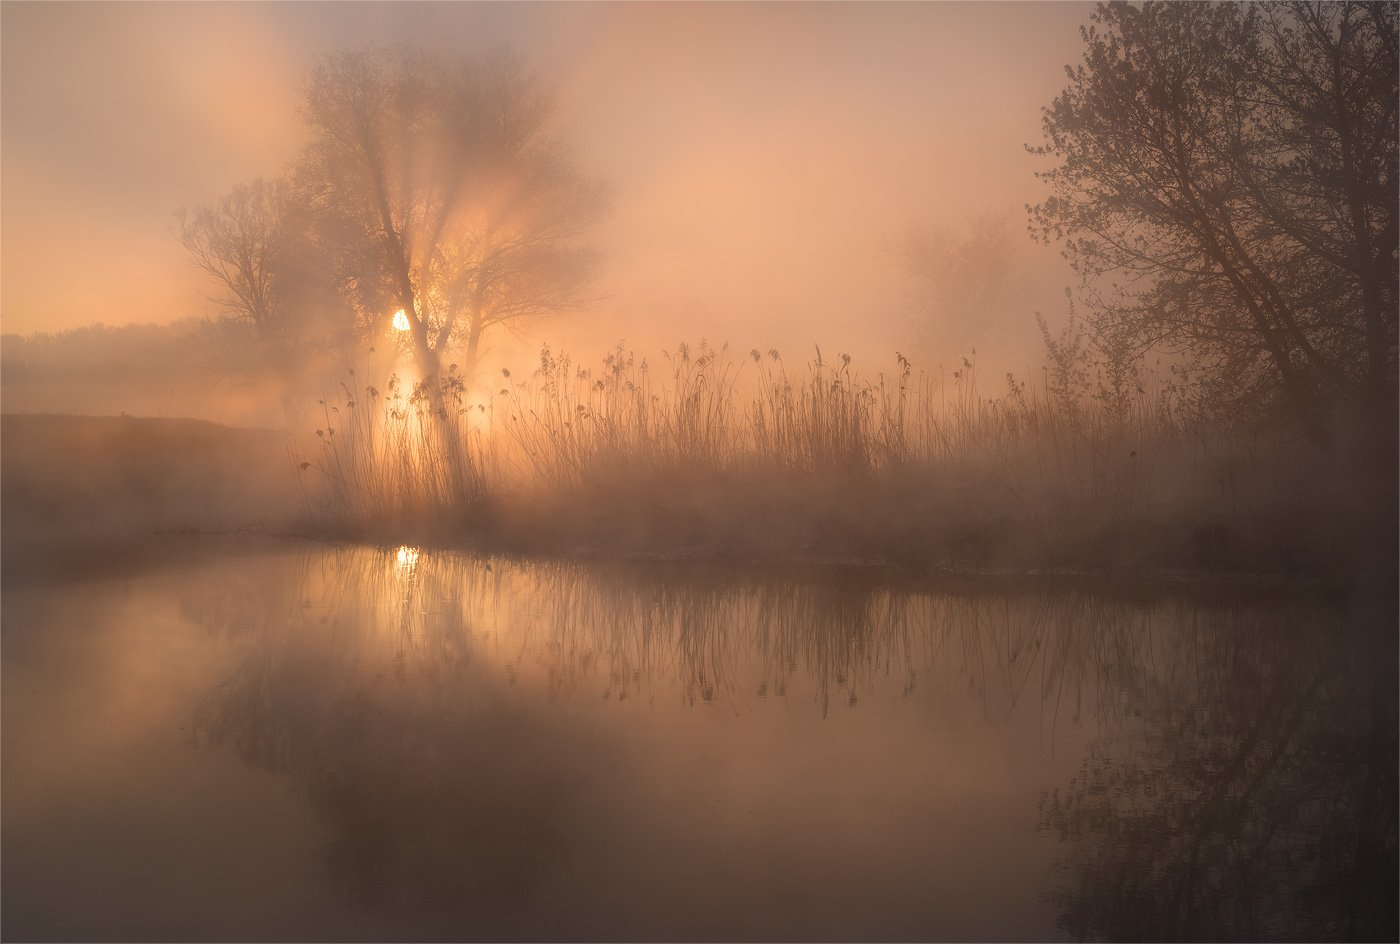 sony, весна, лучи, река, солнце, туман, утро, Александр Киценко